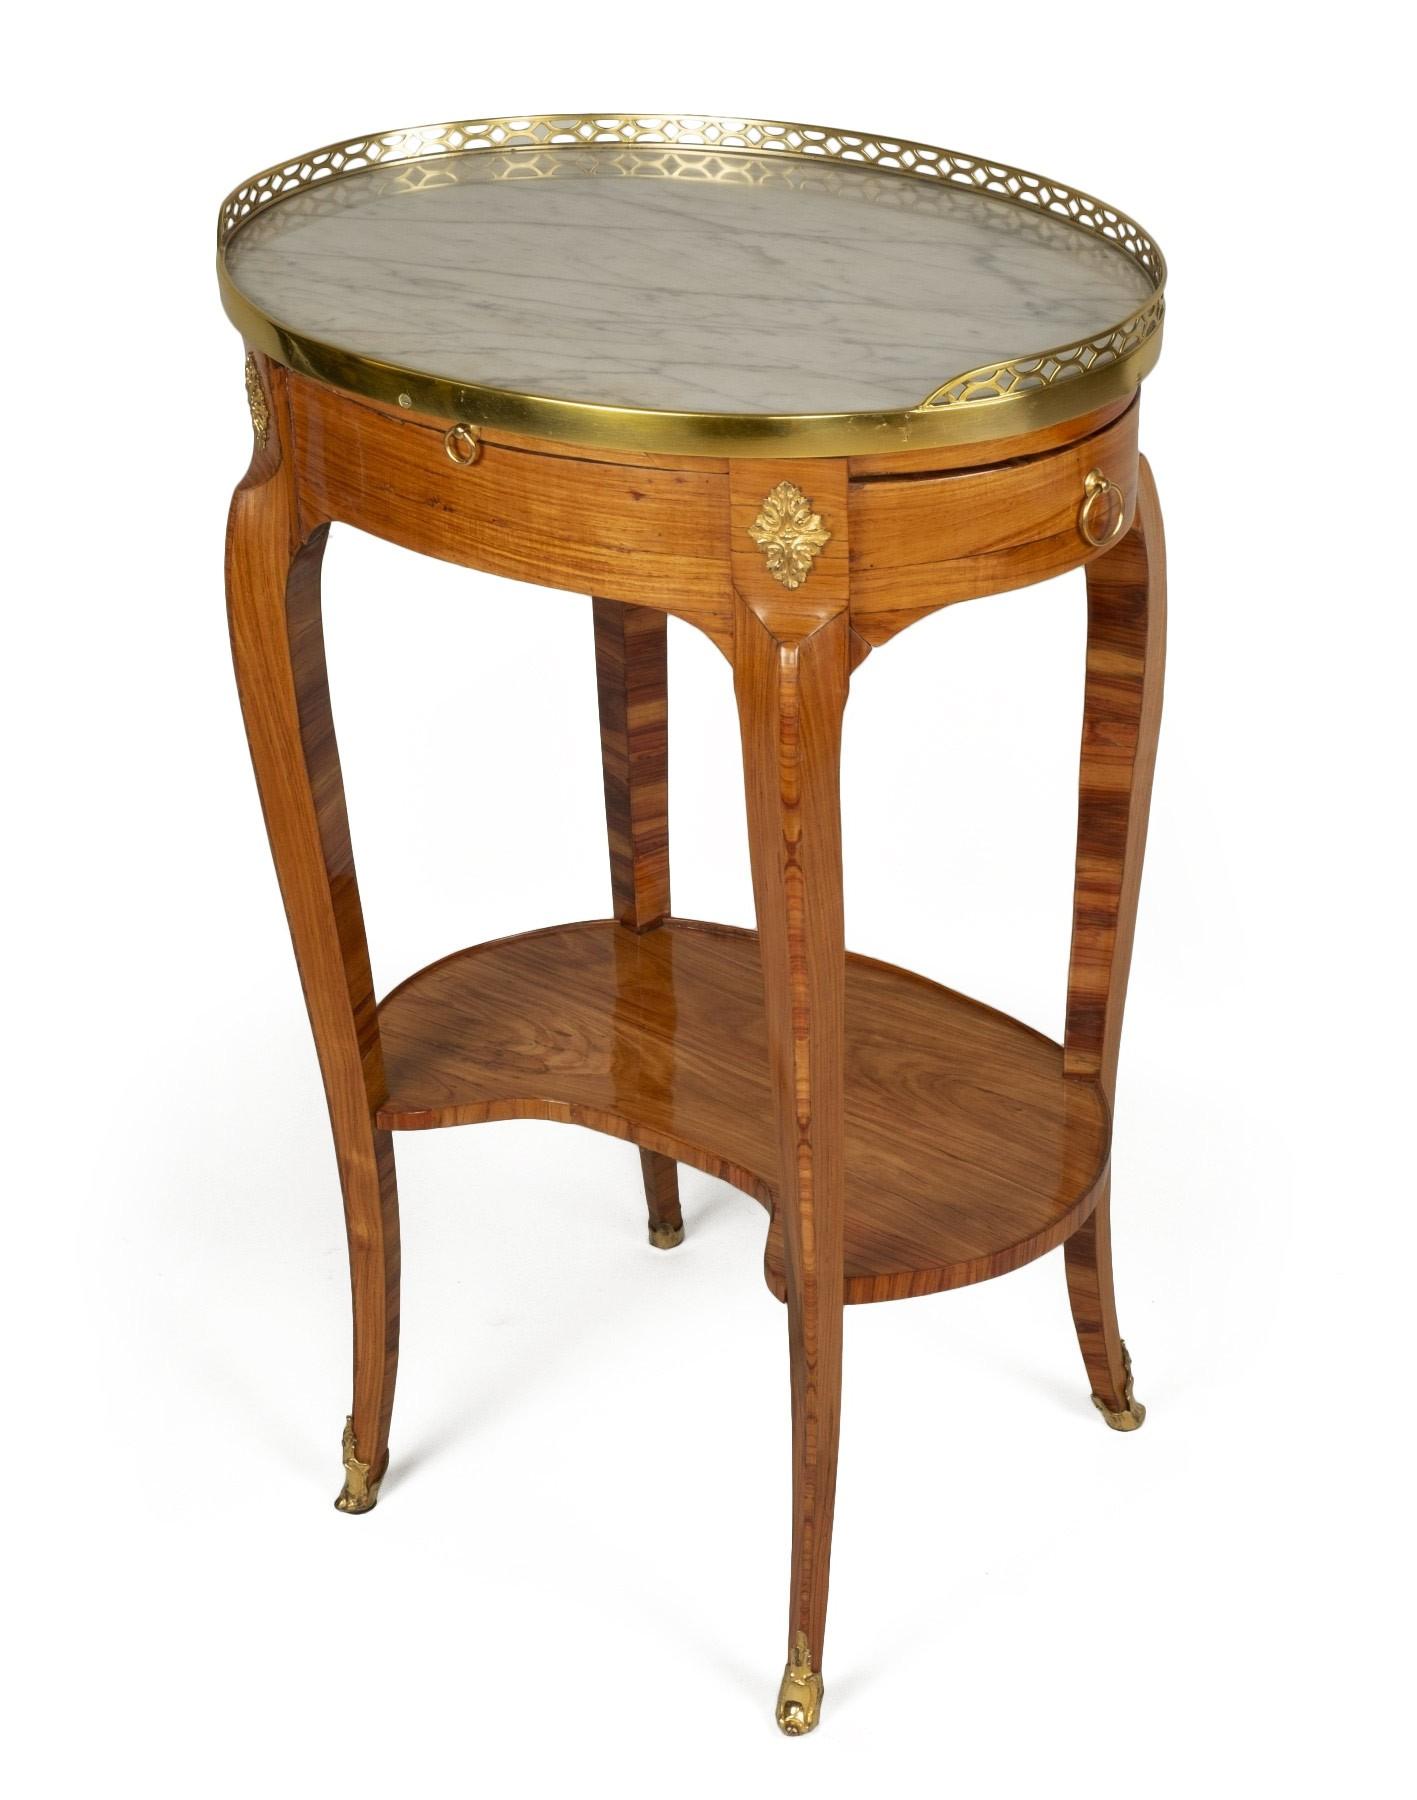 Transition Louis XV/Louis XVI table de salon attributed to